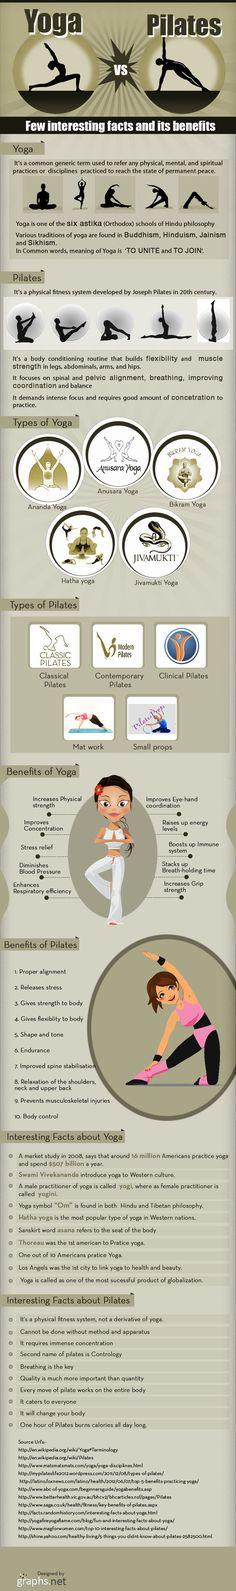 La diferencia entre yoga y pilates. #yoga #pilates #infografia